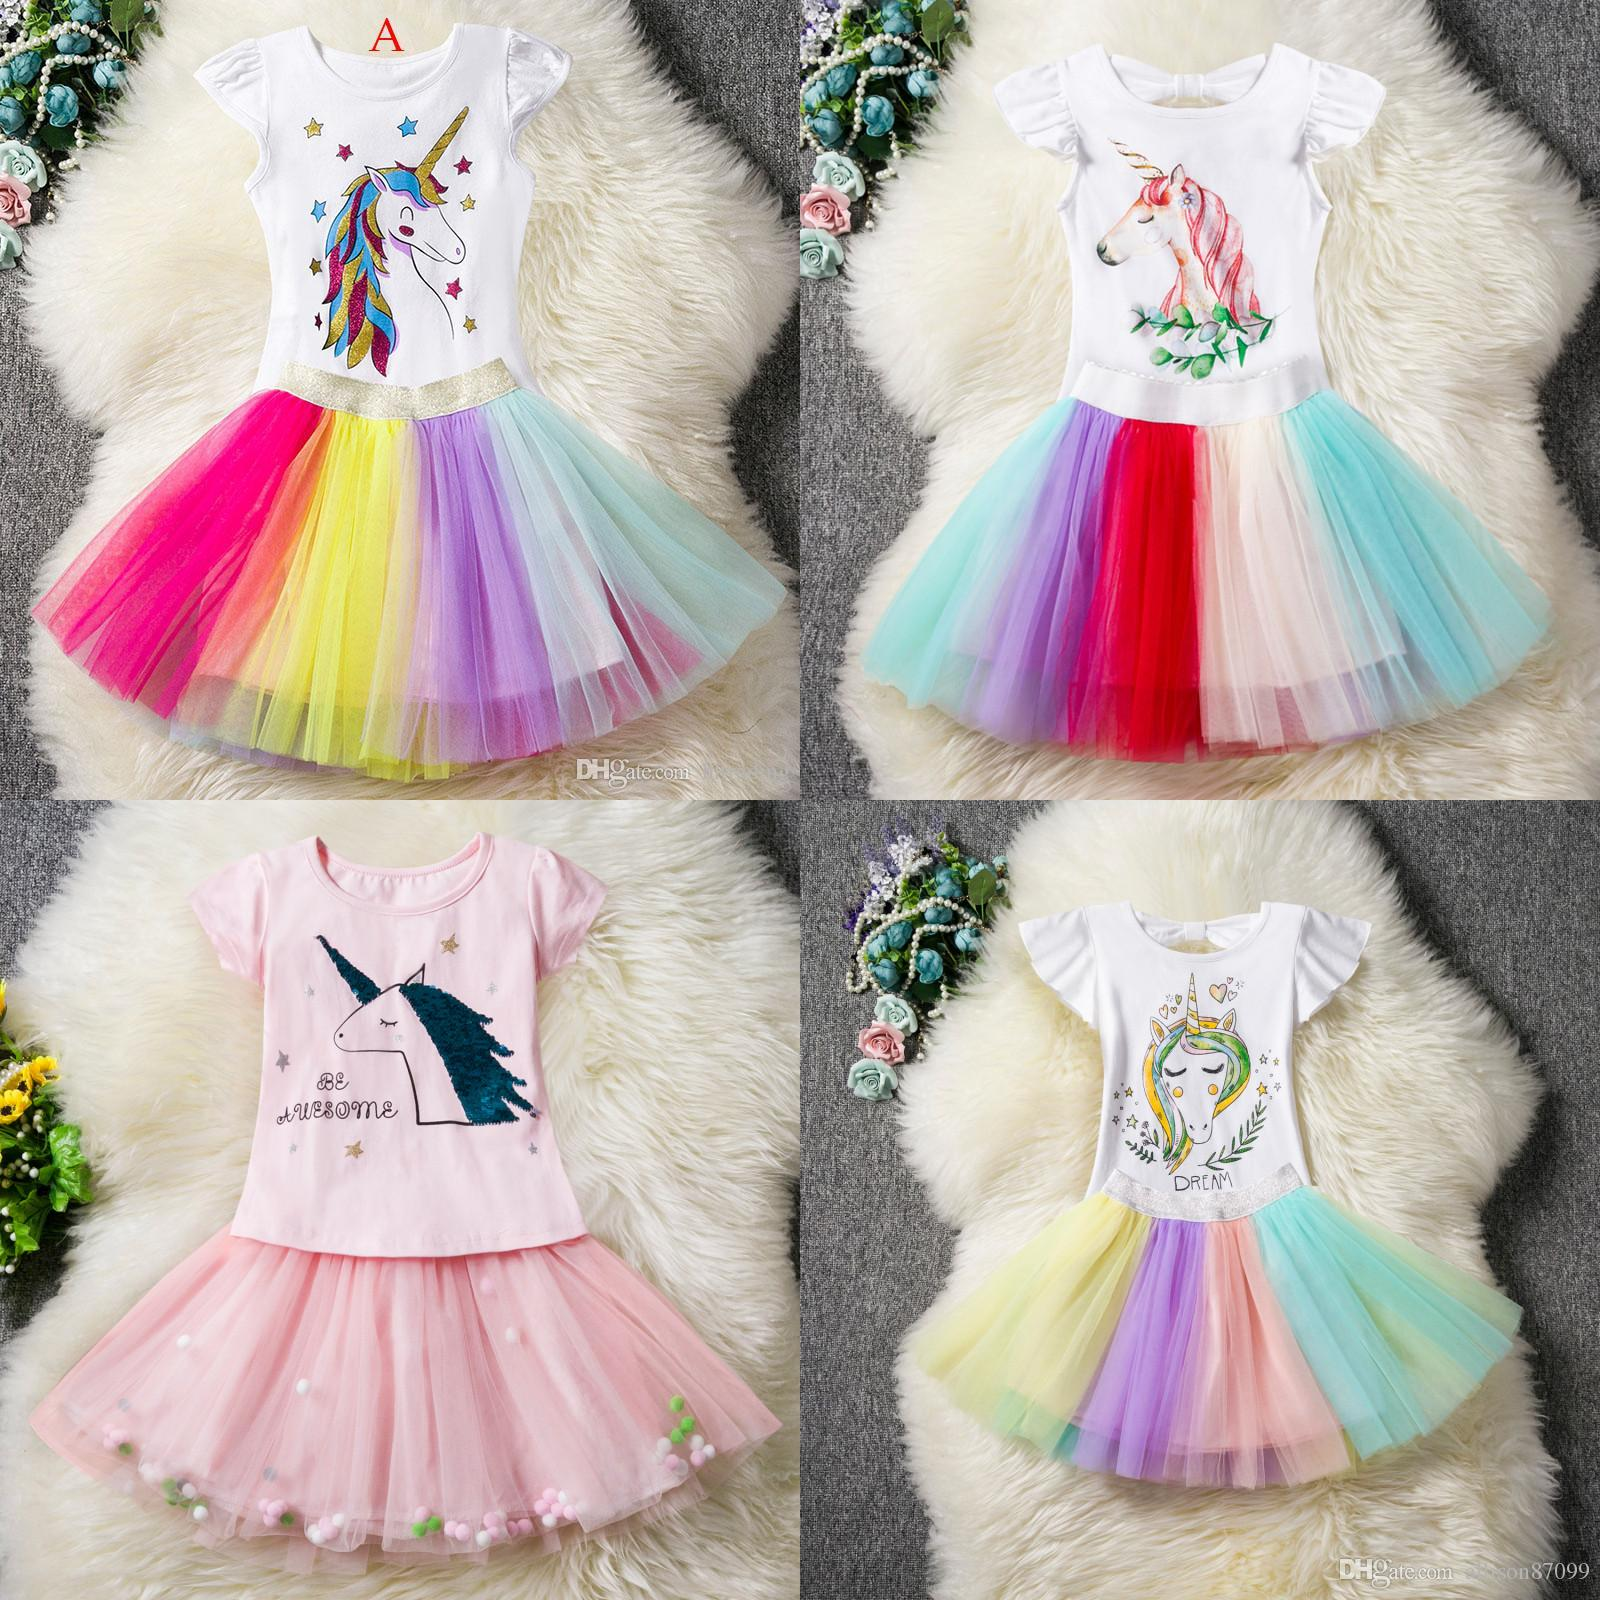 Ins Baby girls Unicorn Outfits Dress Cotton children top Ruffles sleeve +TuTu rainbow skirts 2pcs Cartoon 2019 Fashion Kids Clothing Sets